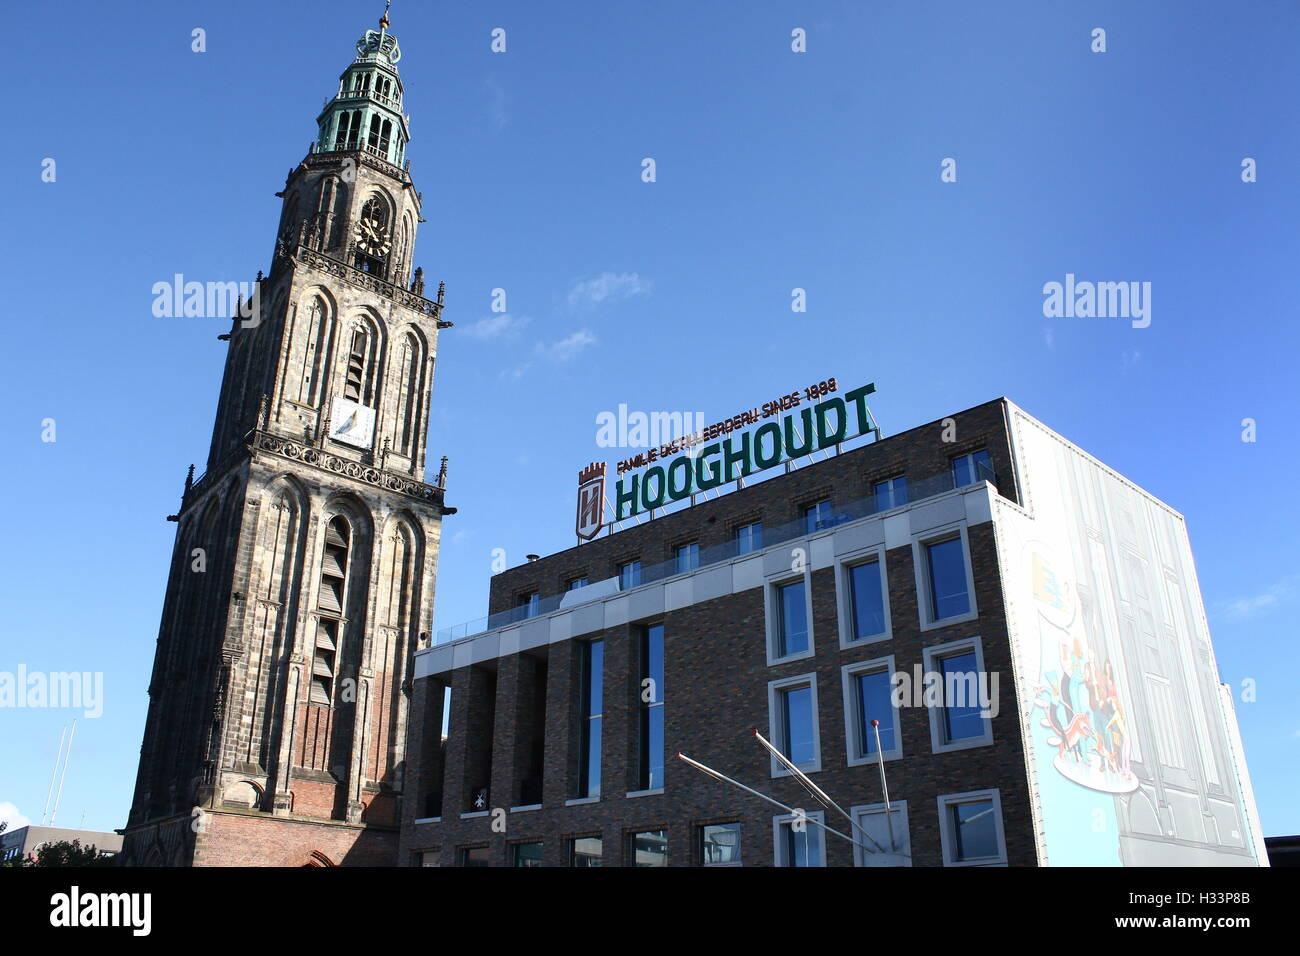 Society building Mutua Fides, student association Vindicat Atque Polit, Grote Markt,  Groningen, Netherlands with Stock Photo